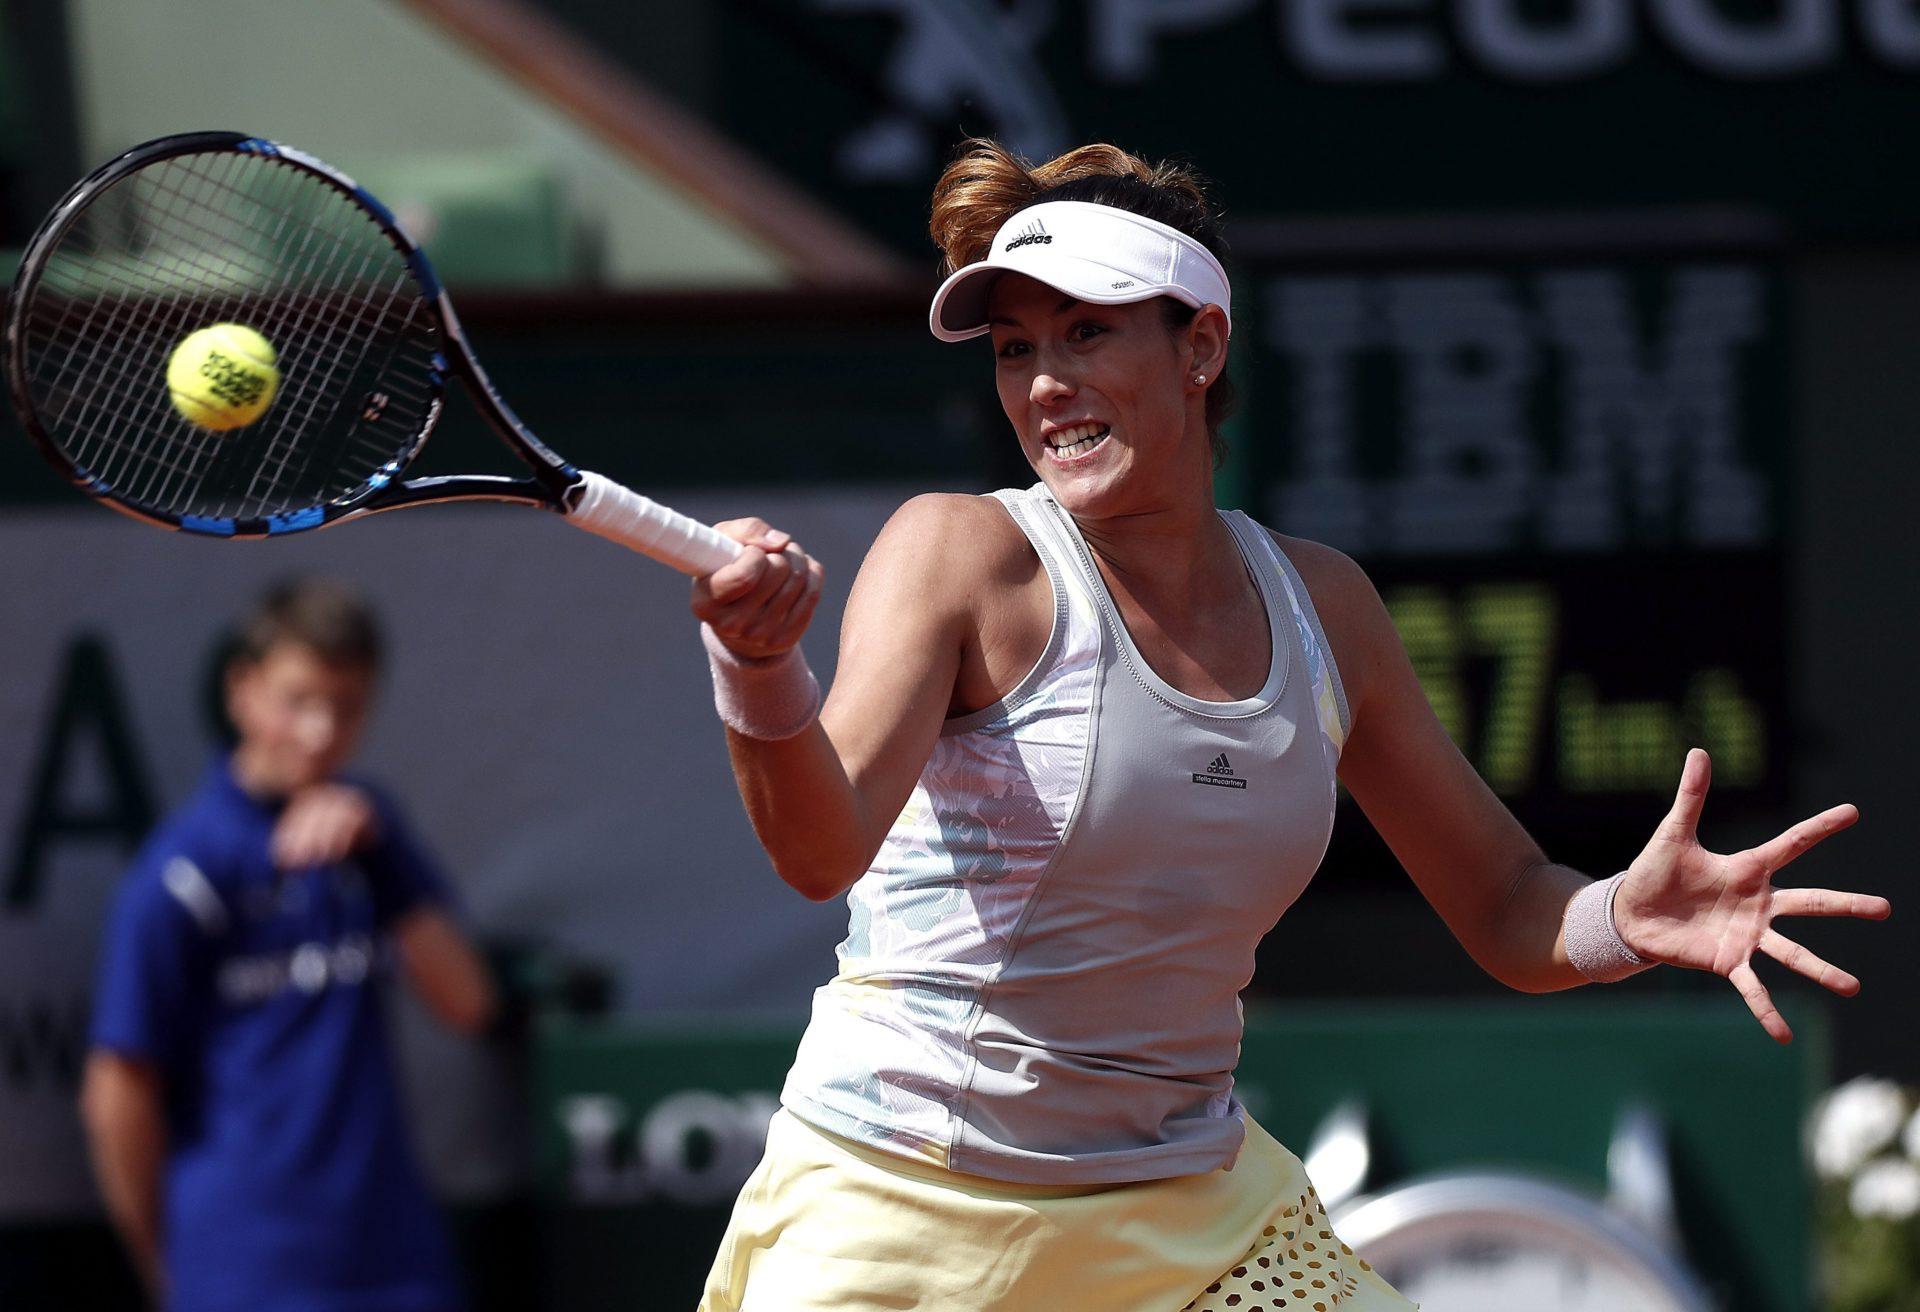 Fotografía de Garbiñe Muguruza en partido de tercera ronda de Roland Garros 2016